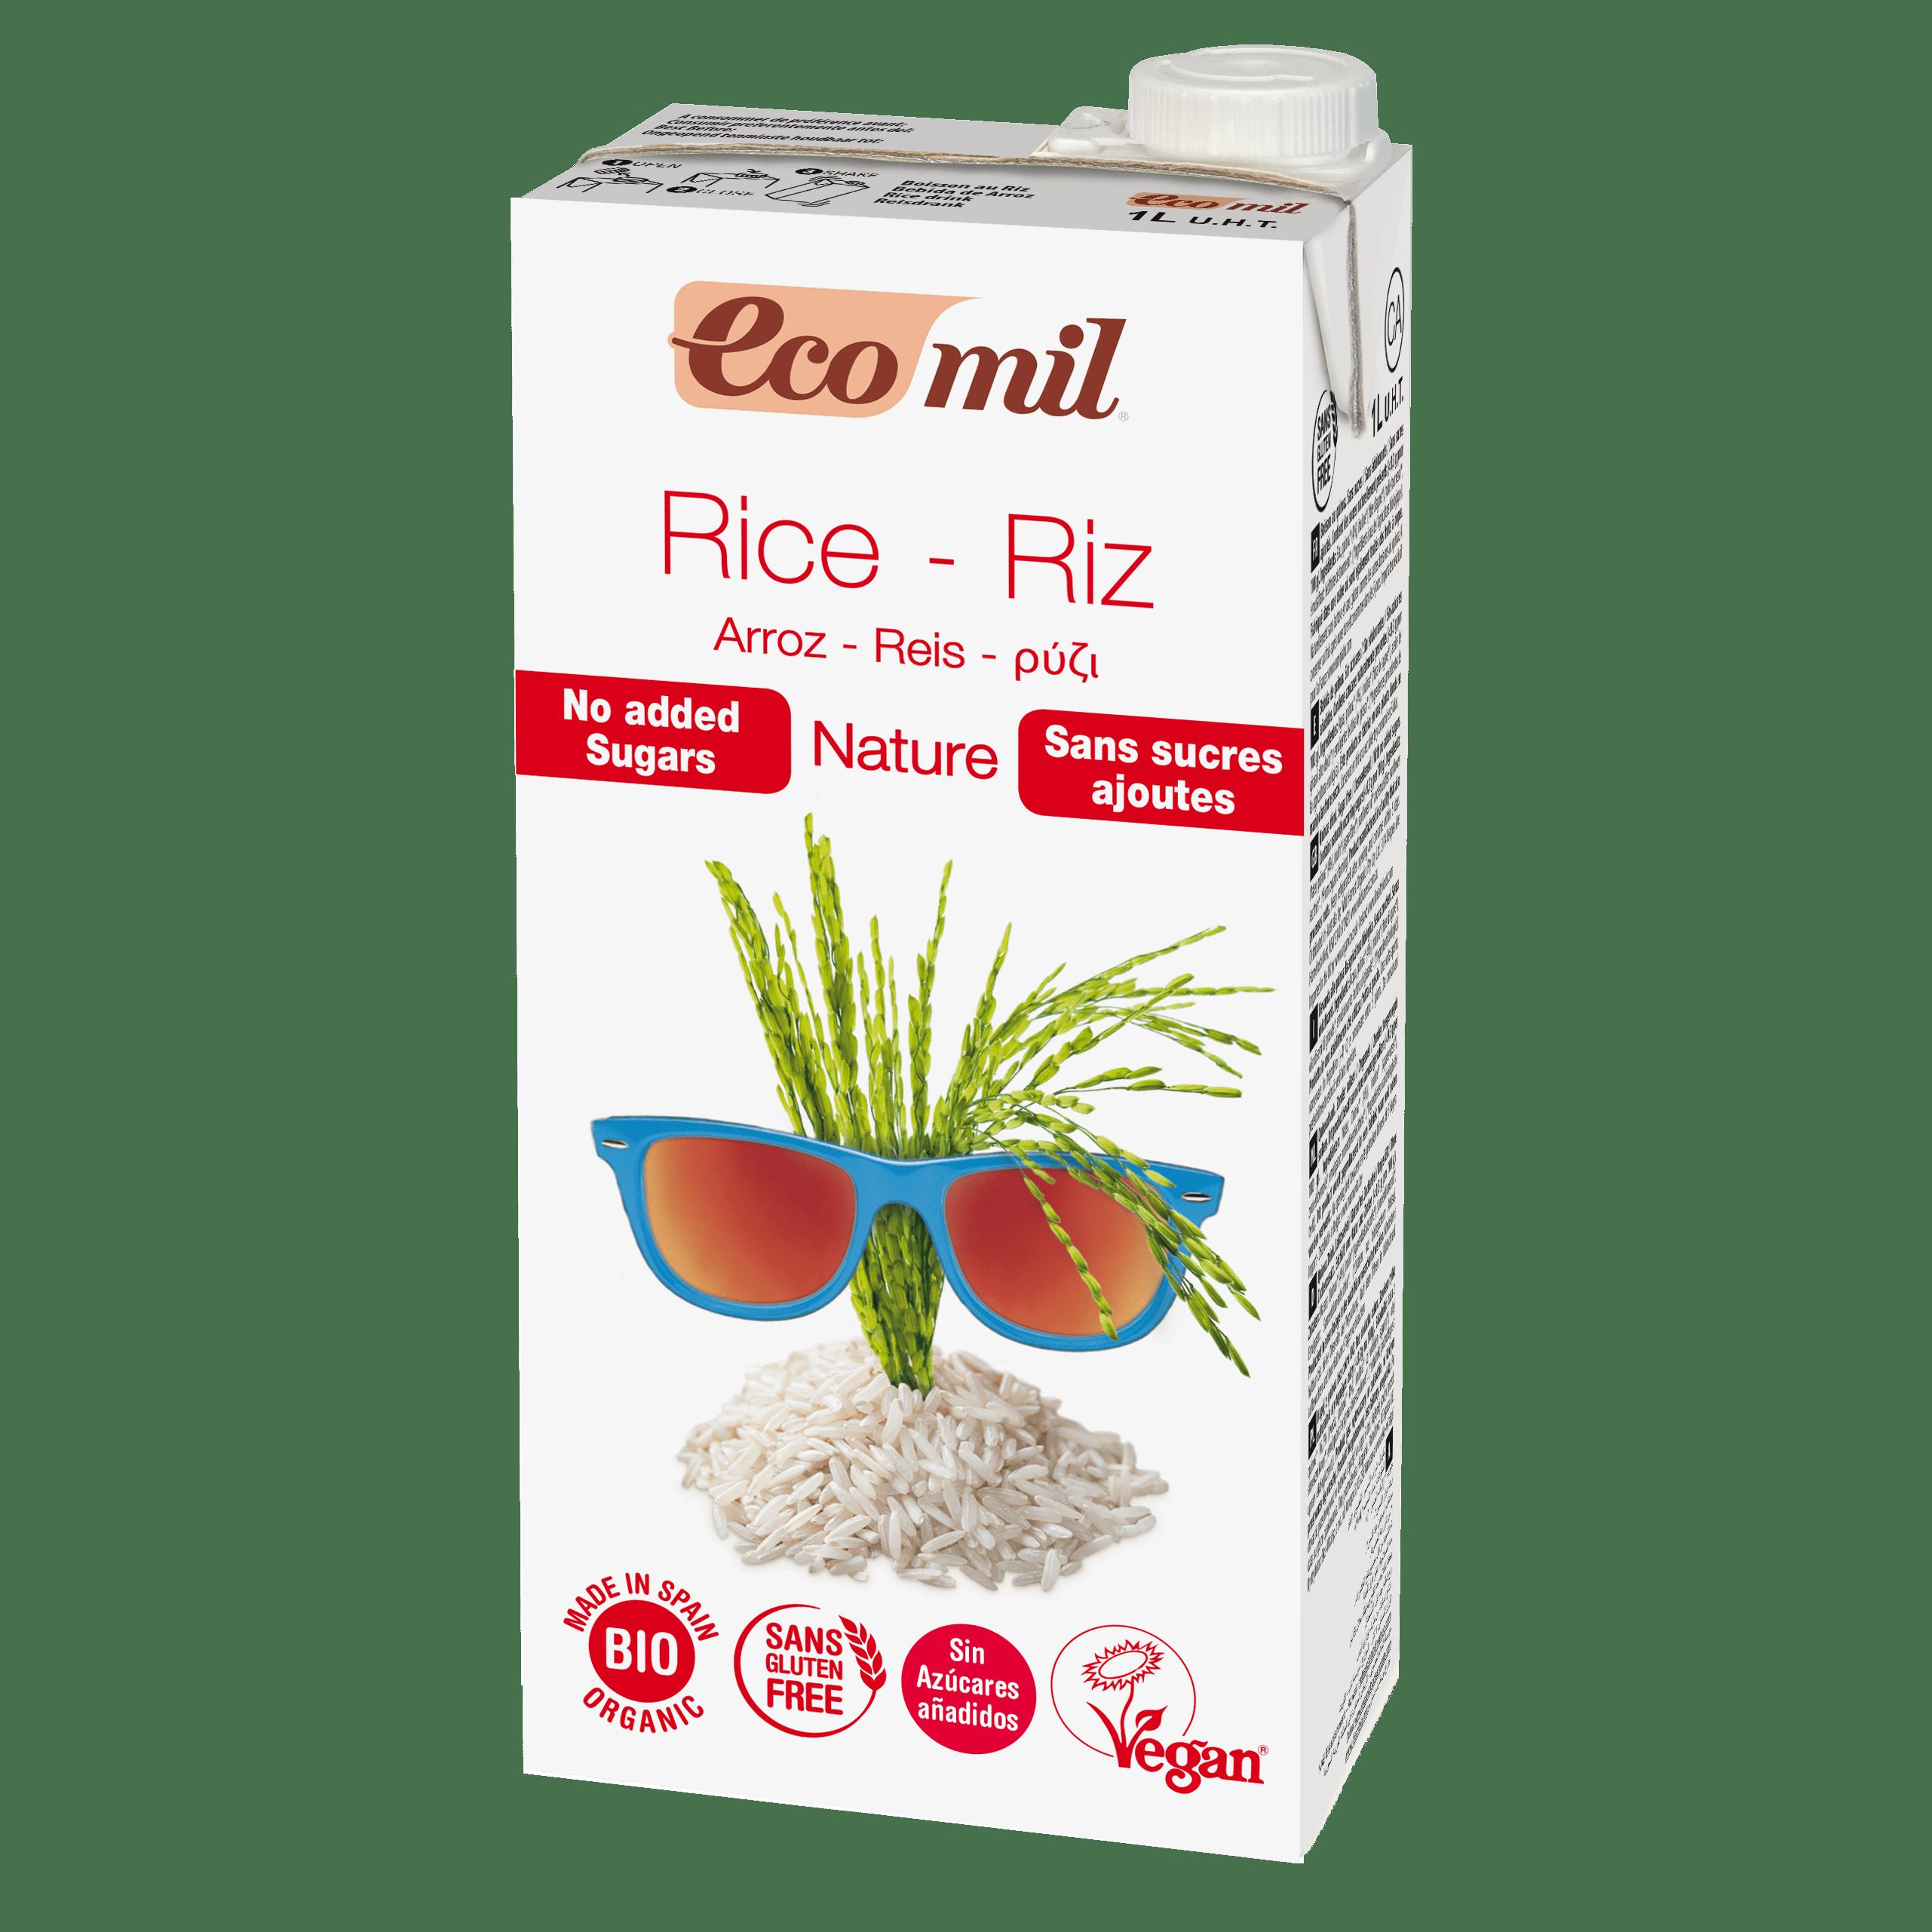 Органічне рослинне молоко з рису без додавання цукру, 1л - купить в интернет-магазине Юнимед